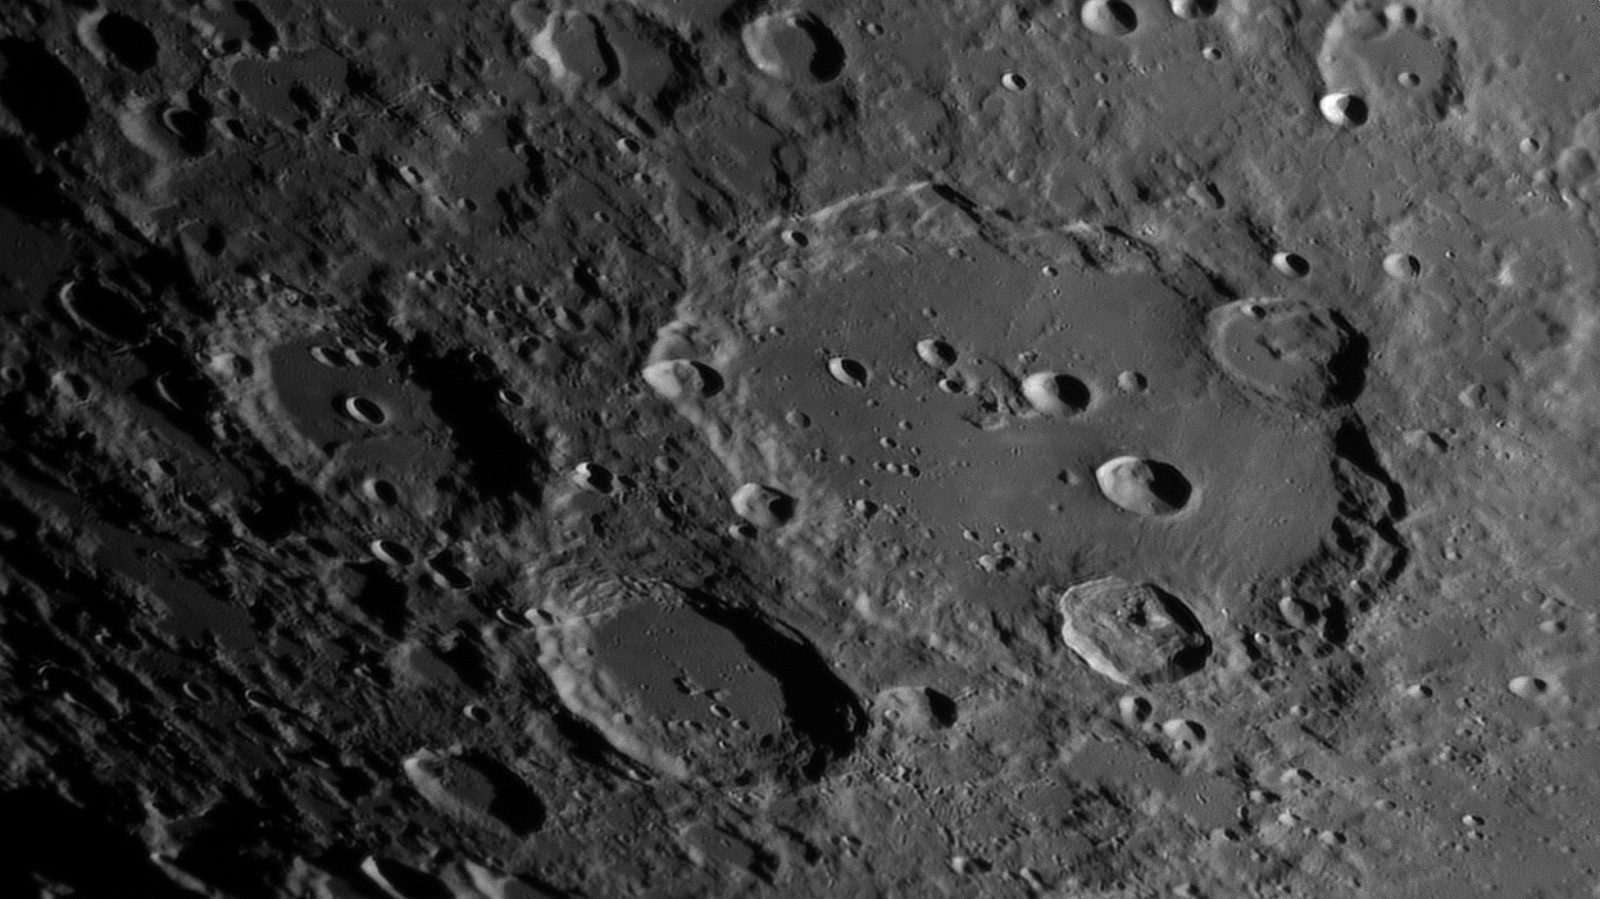 Clavius_2021-04-23T00_32_25_R.thumb.jpg.e995333a0f8fcc26768c0946dda71ffc.jpg